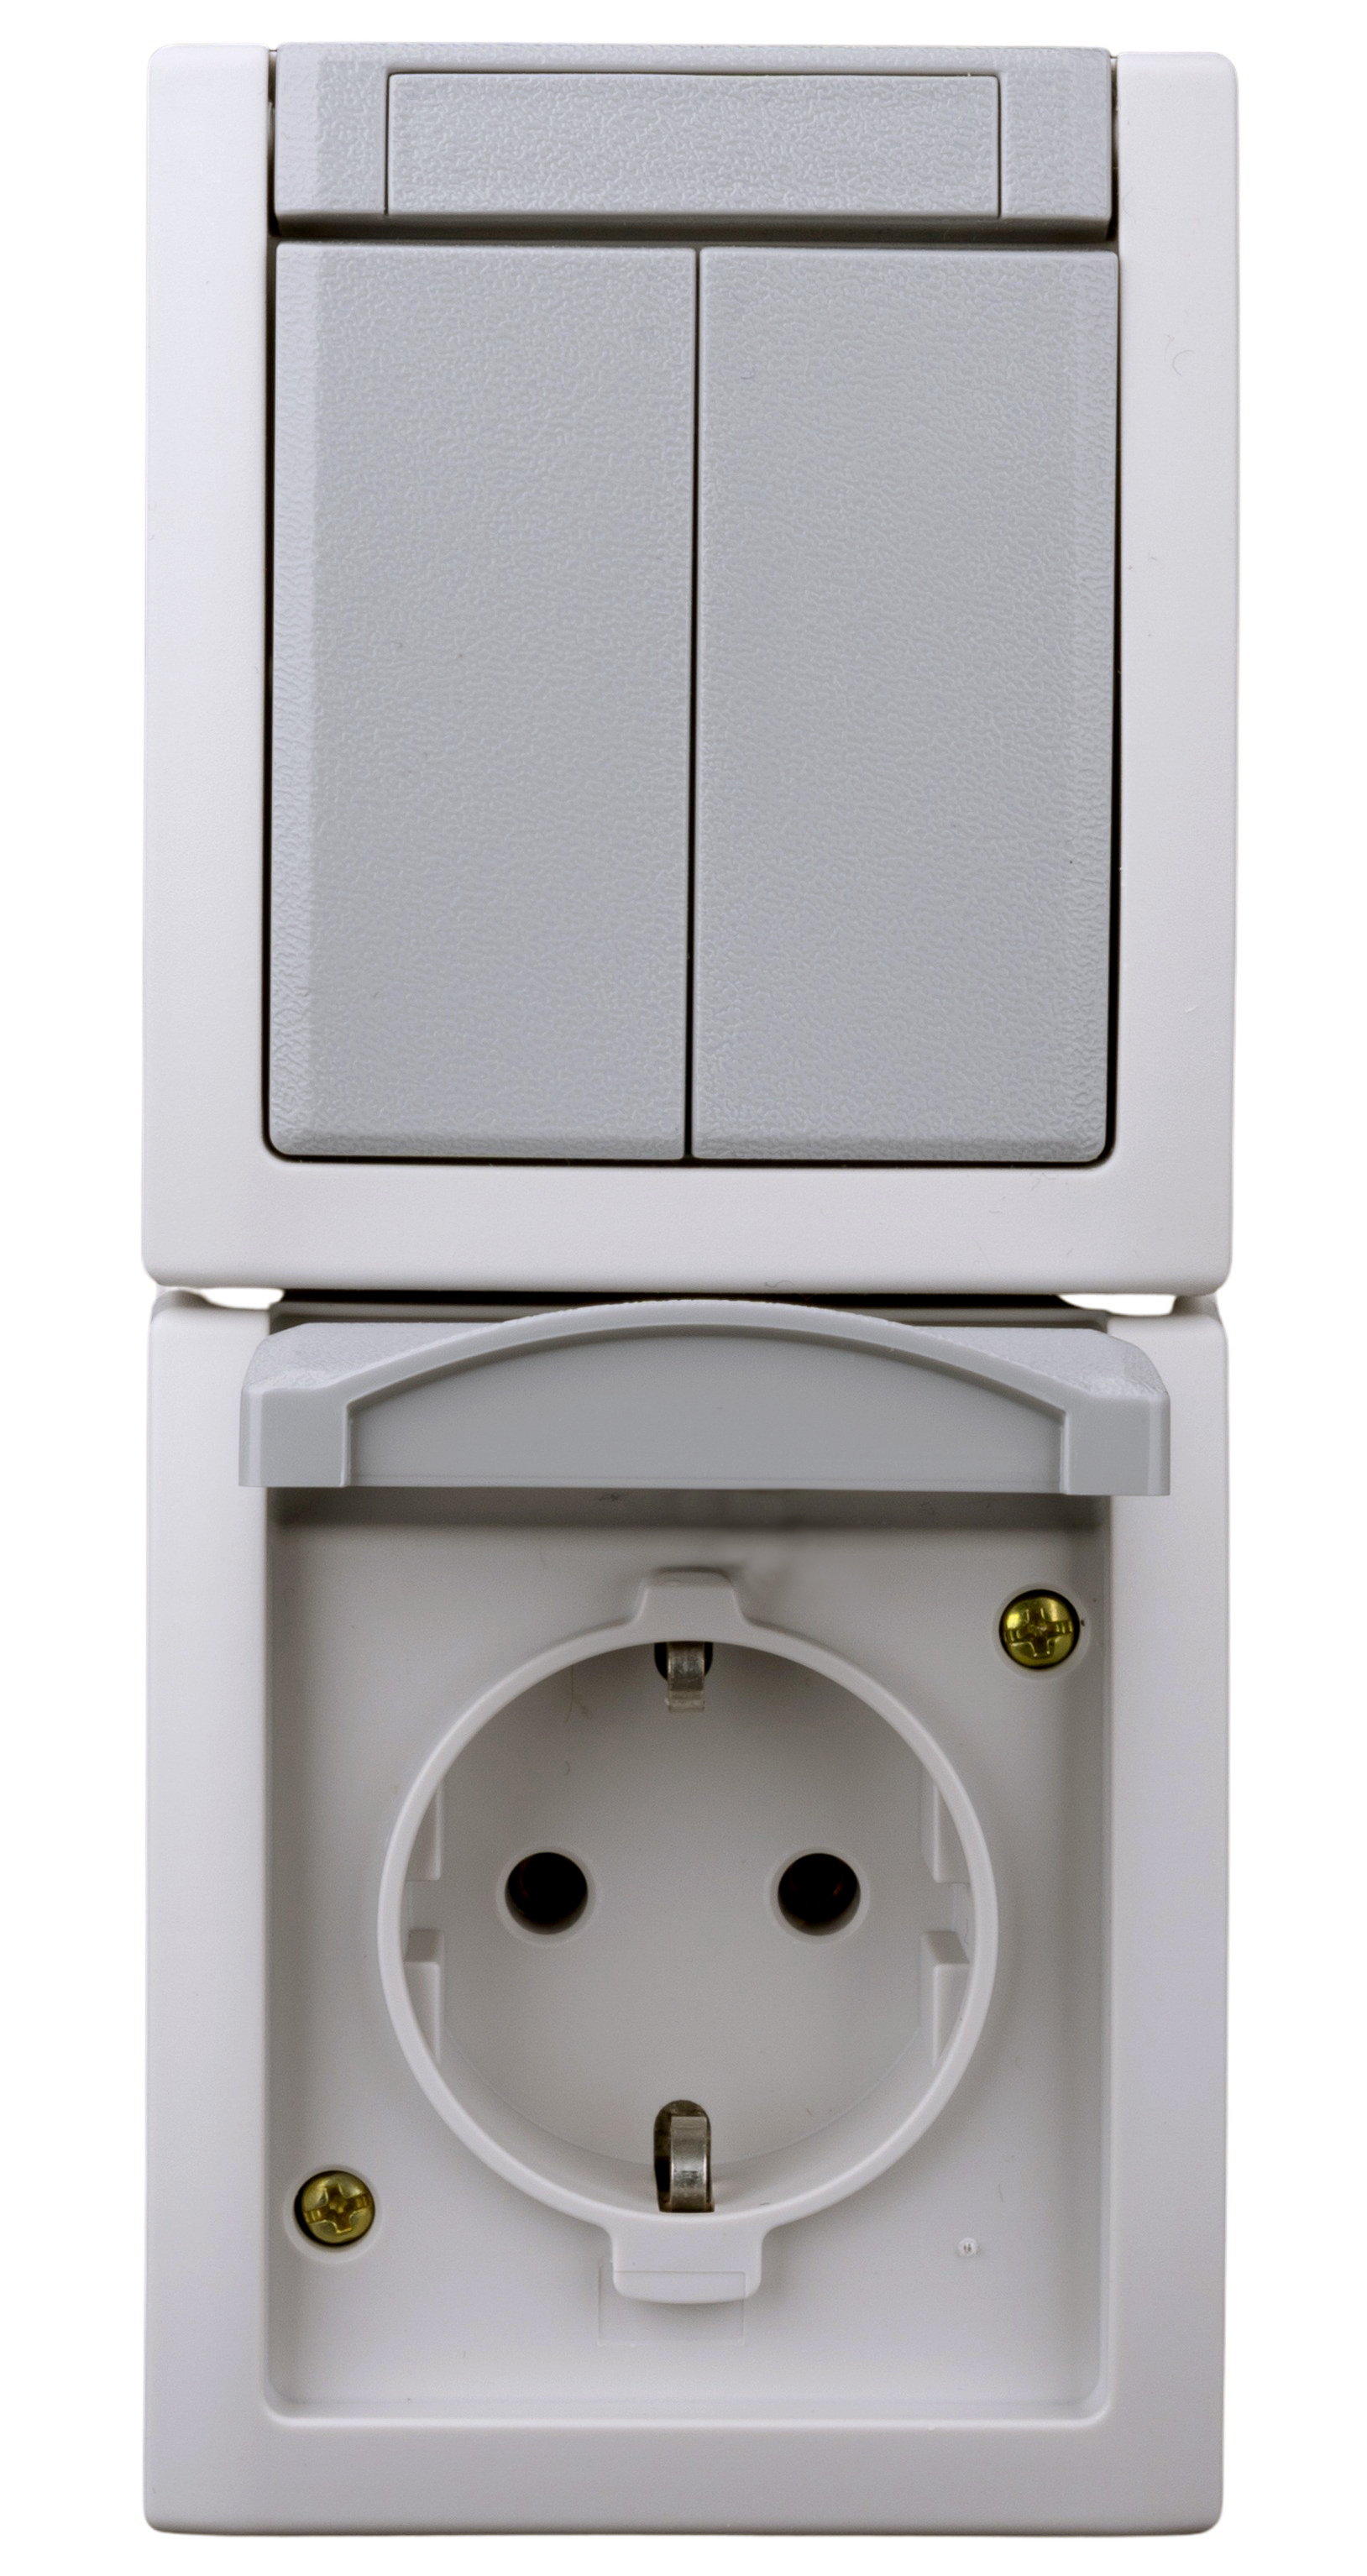 1 Stk AP-Kombination Serienschalter-Steckdose, Steckklemme, IP54 EV211004--